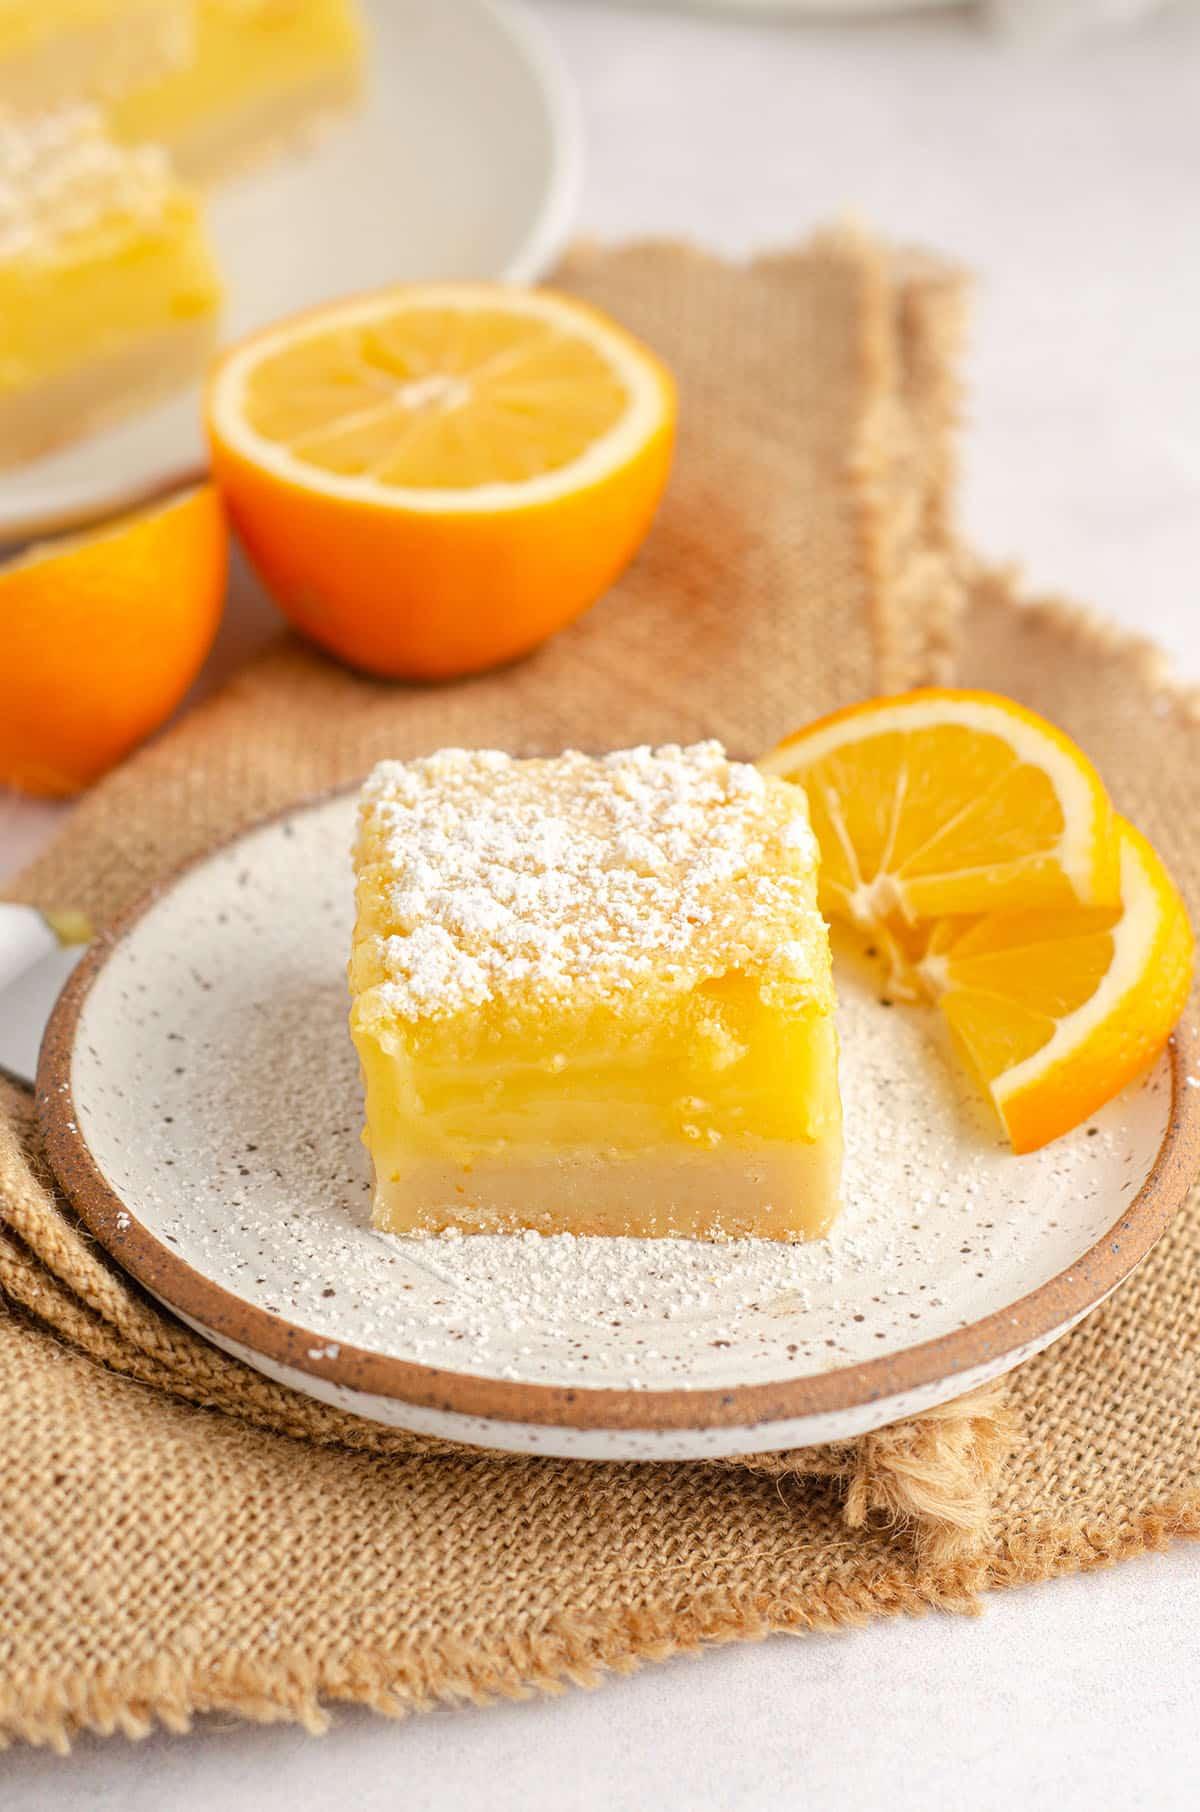 meyer lemon bar sitting on a plate with slices of meyer lemon